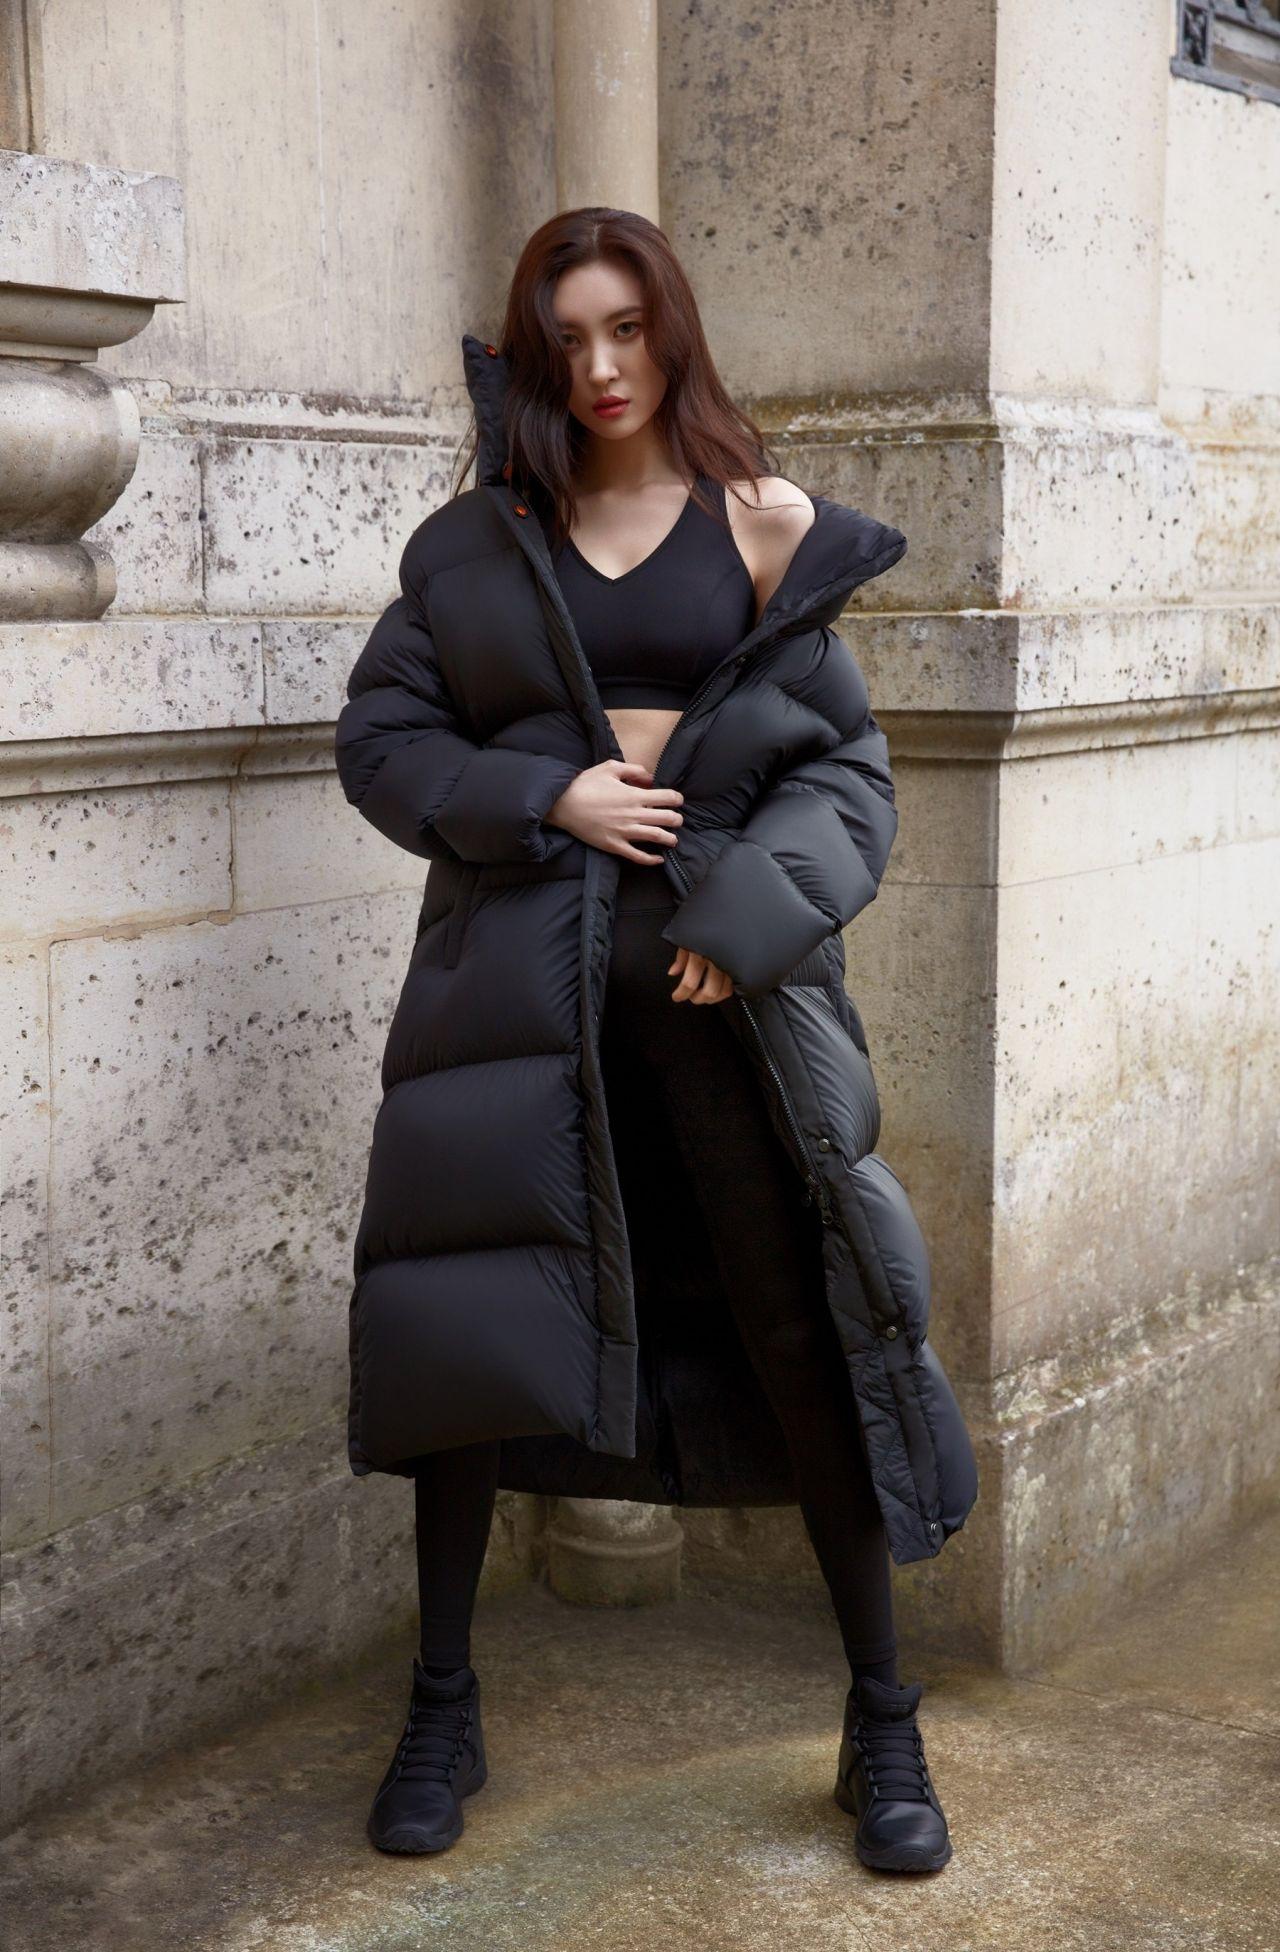 Lee sunmi photoshoot for head sports fall winter 2019